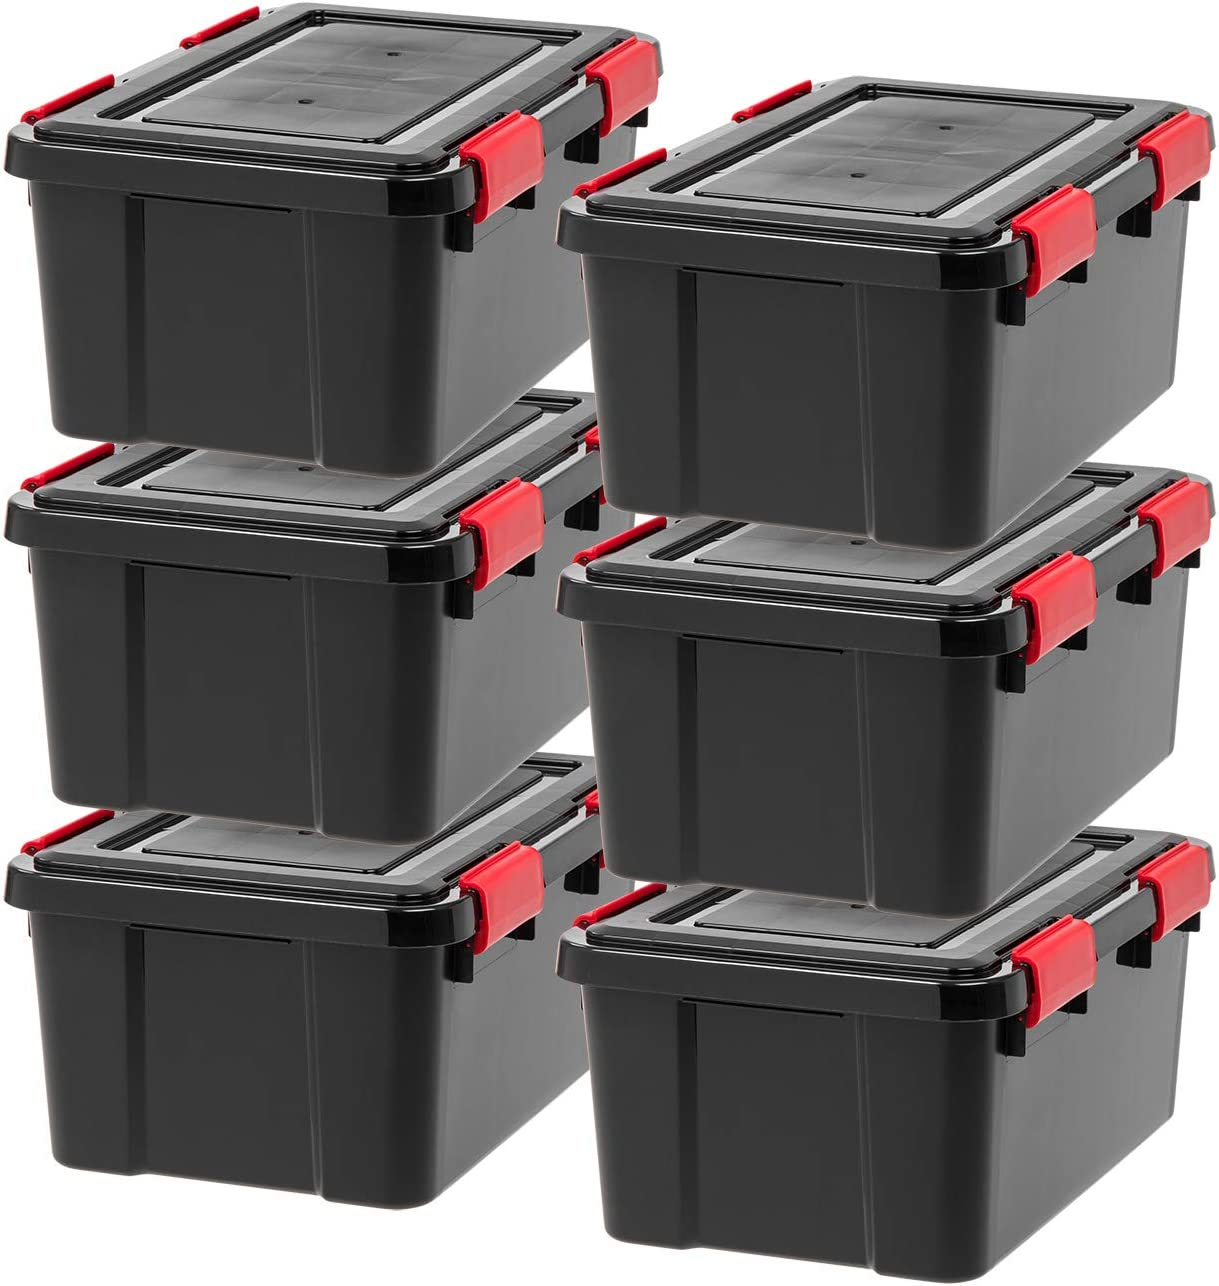 iris UCB-SS WEATHERTIGHT Storage Box, 19 Quart, Black, 6 Pack